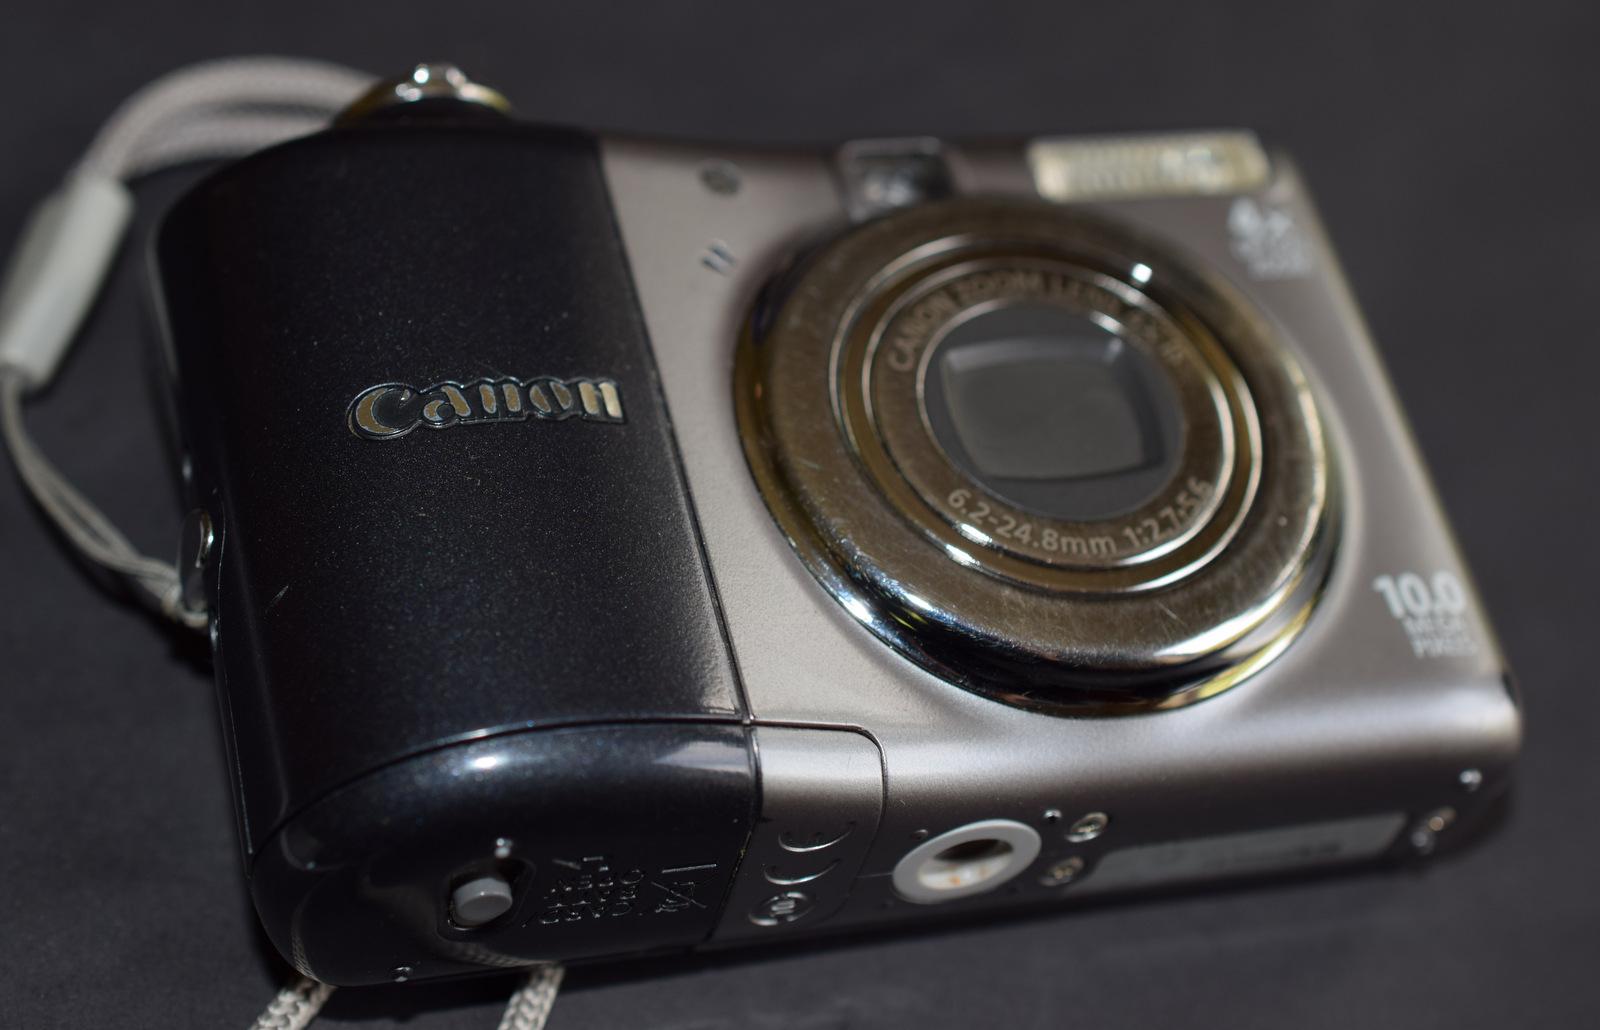 Lot 23 - Canon PowerShot A1000 IS 10.0MP Digital Camera